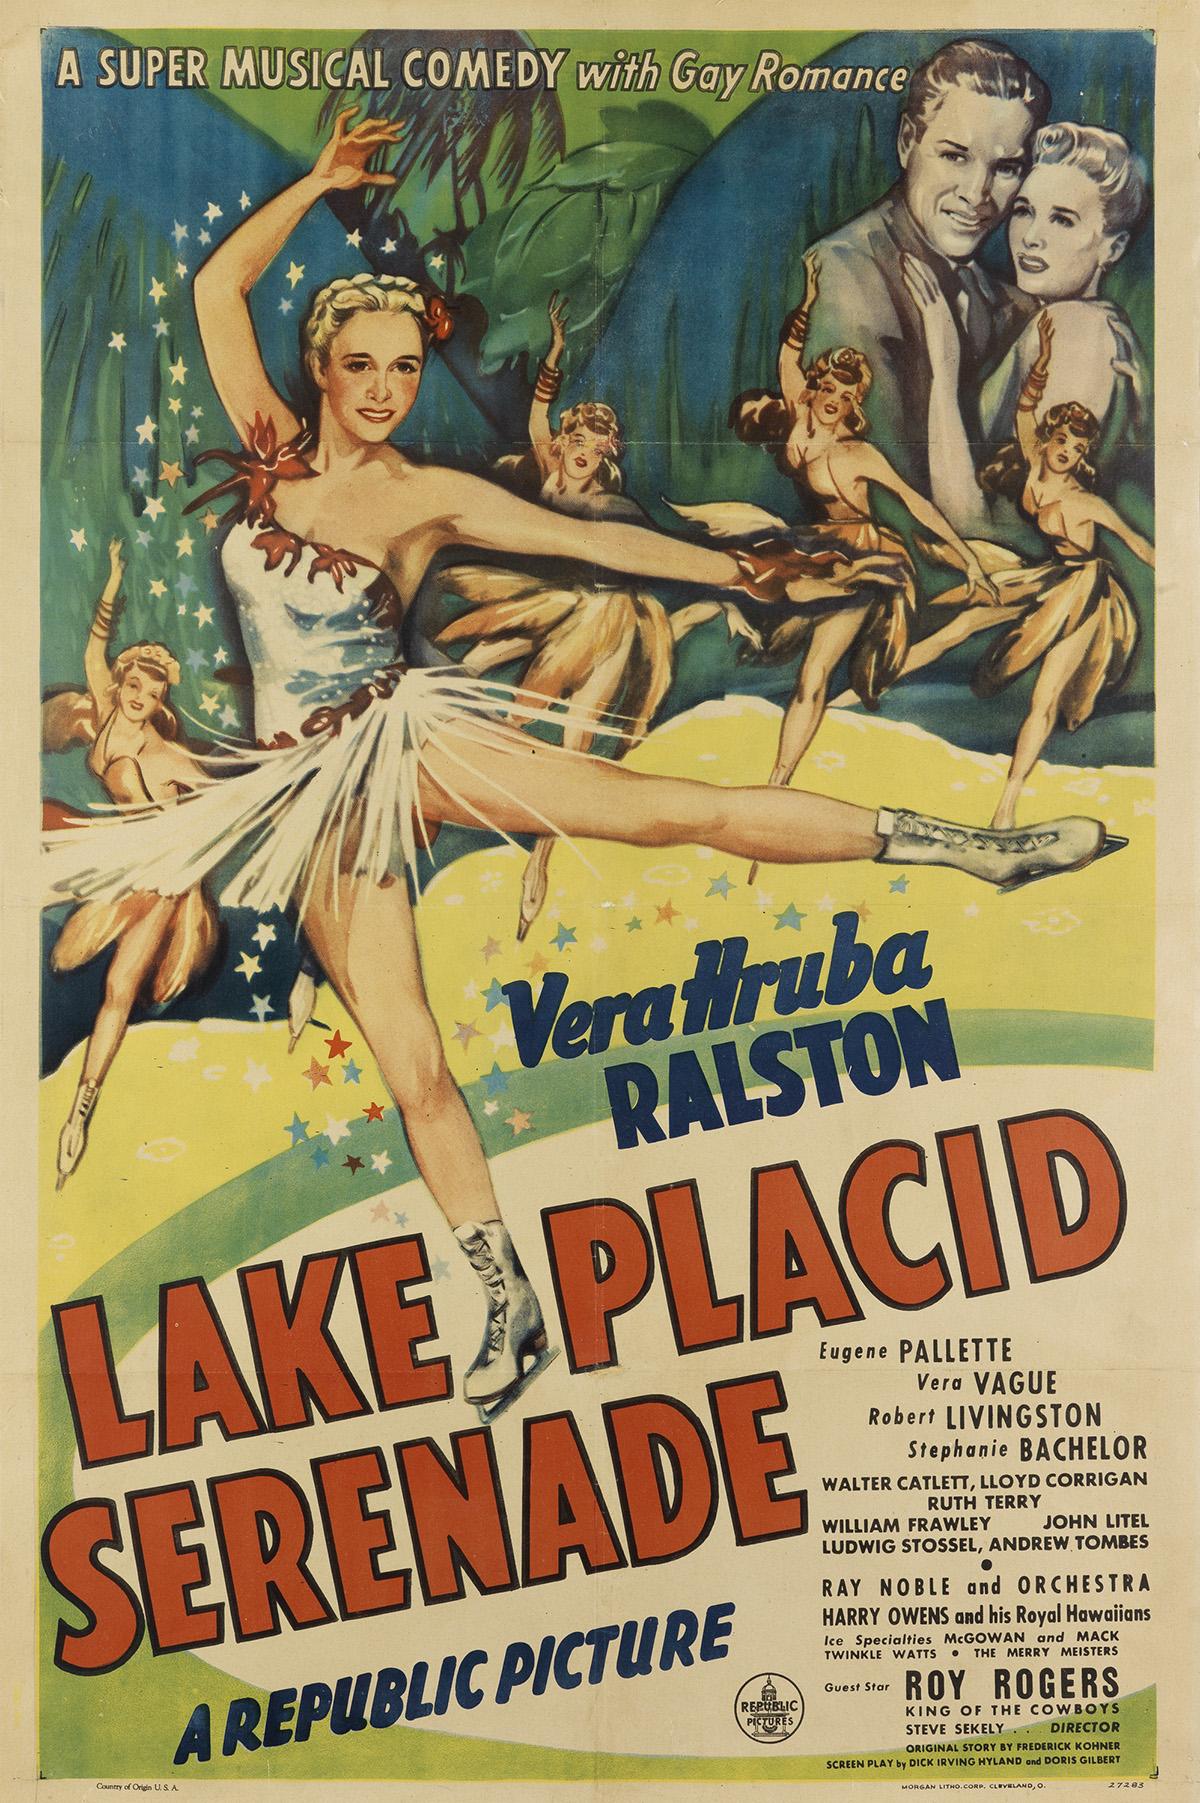 DESIGNER-UNKNOWN-LAKE-PLACID-SERENADE-1944-40x27-inches-102x